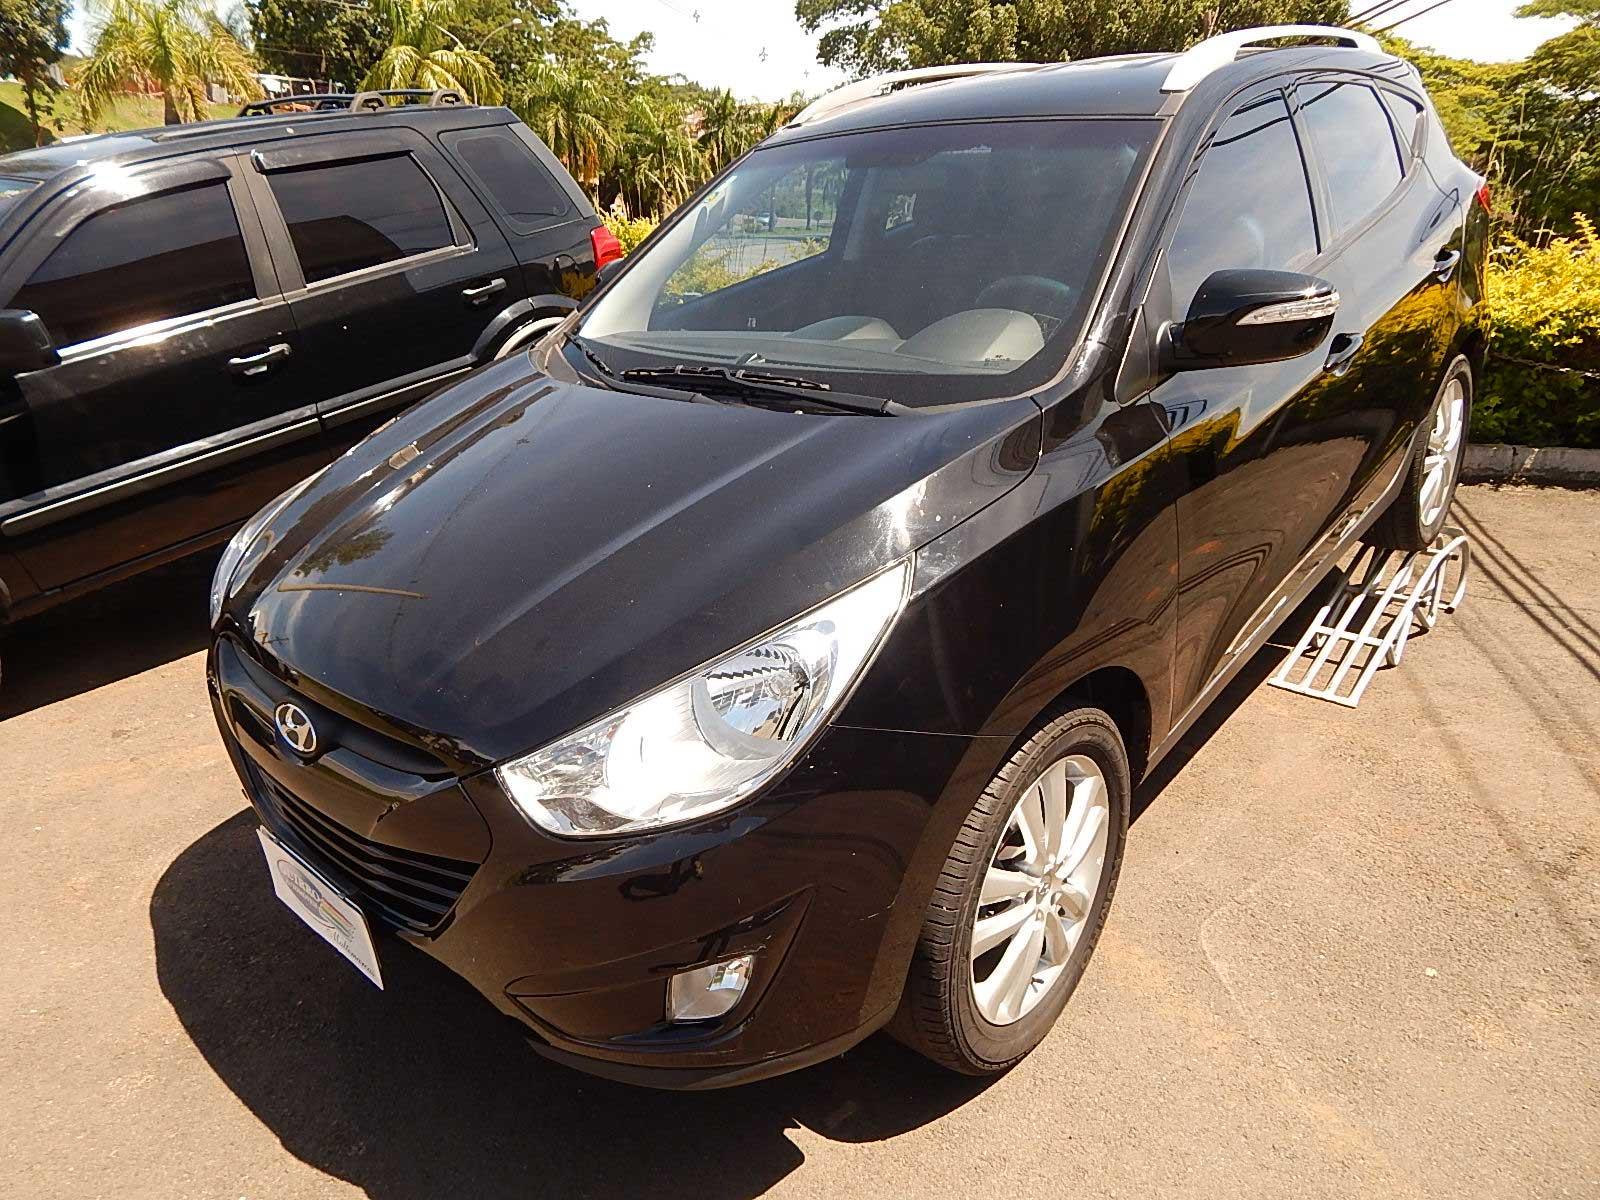 2011/2011 - Gasolina